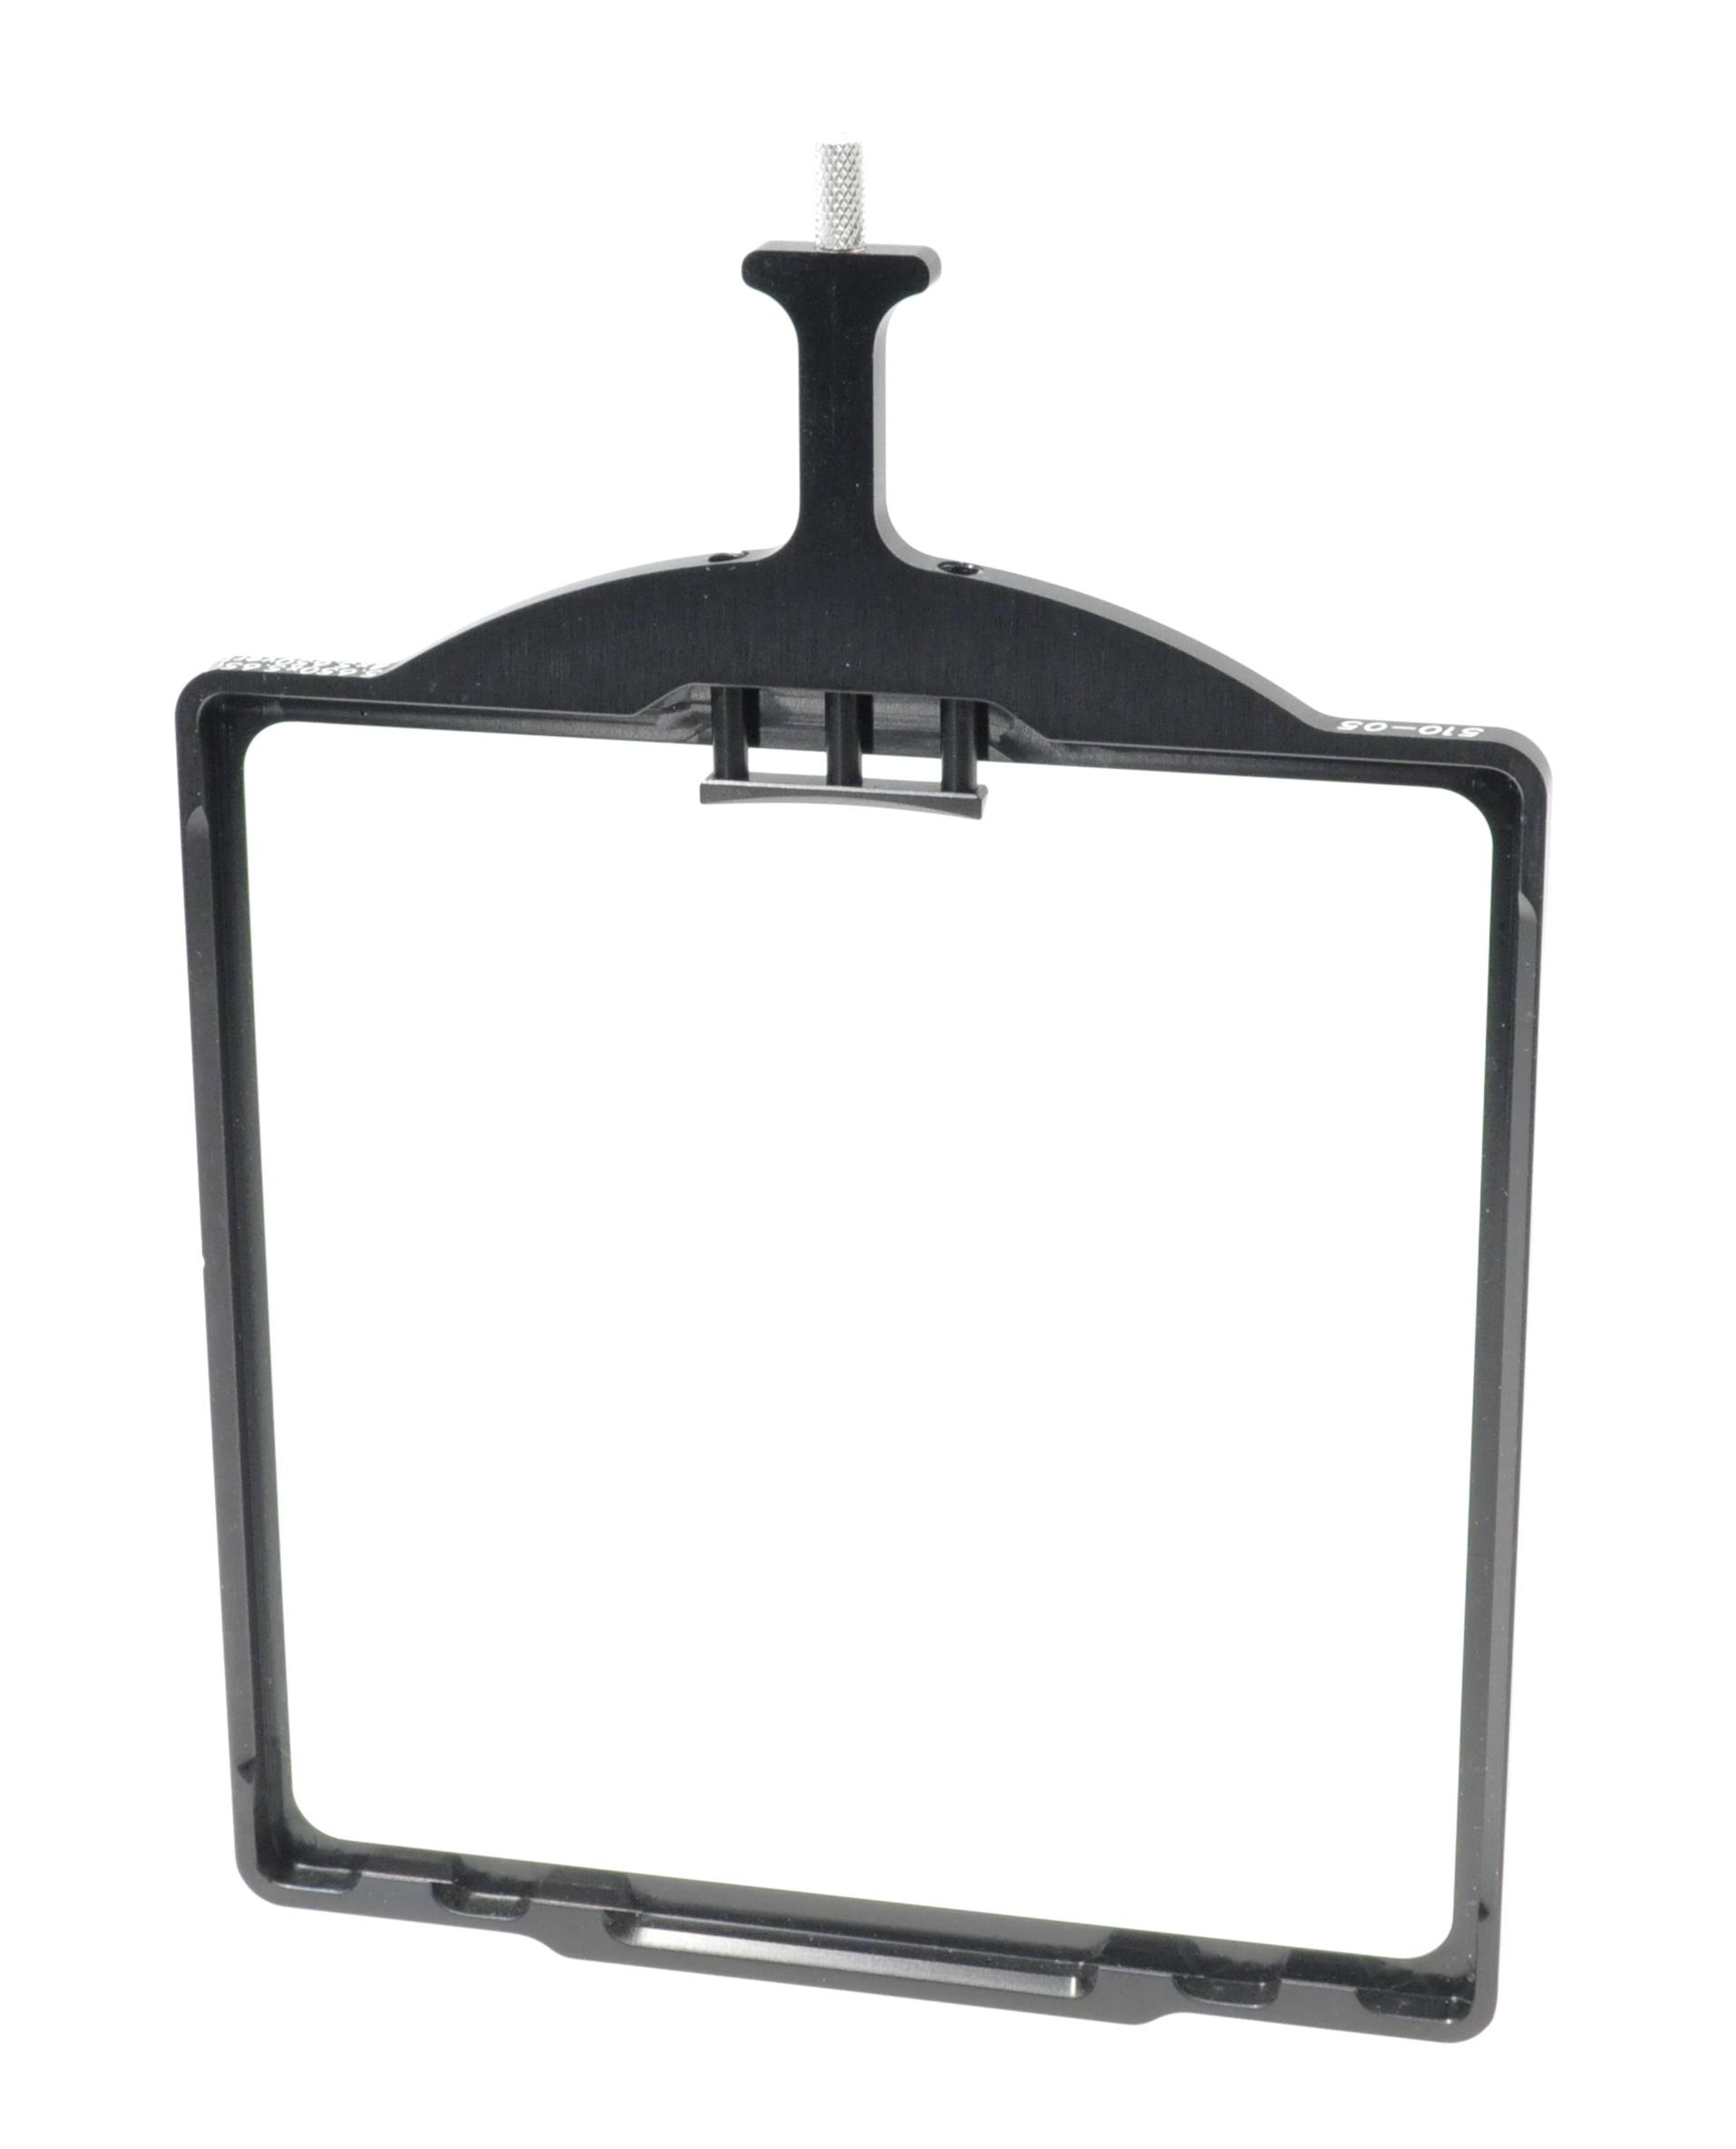 Filterhalter 5.65x5.65 / 4x5.65